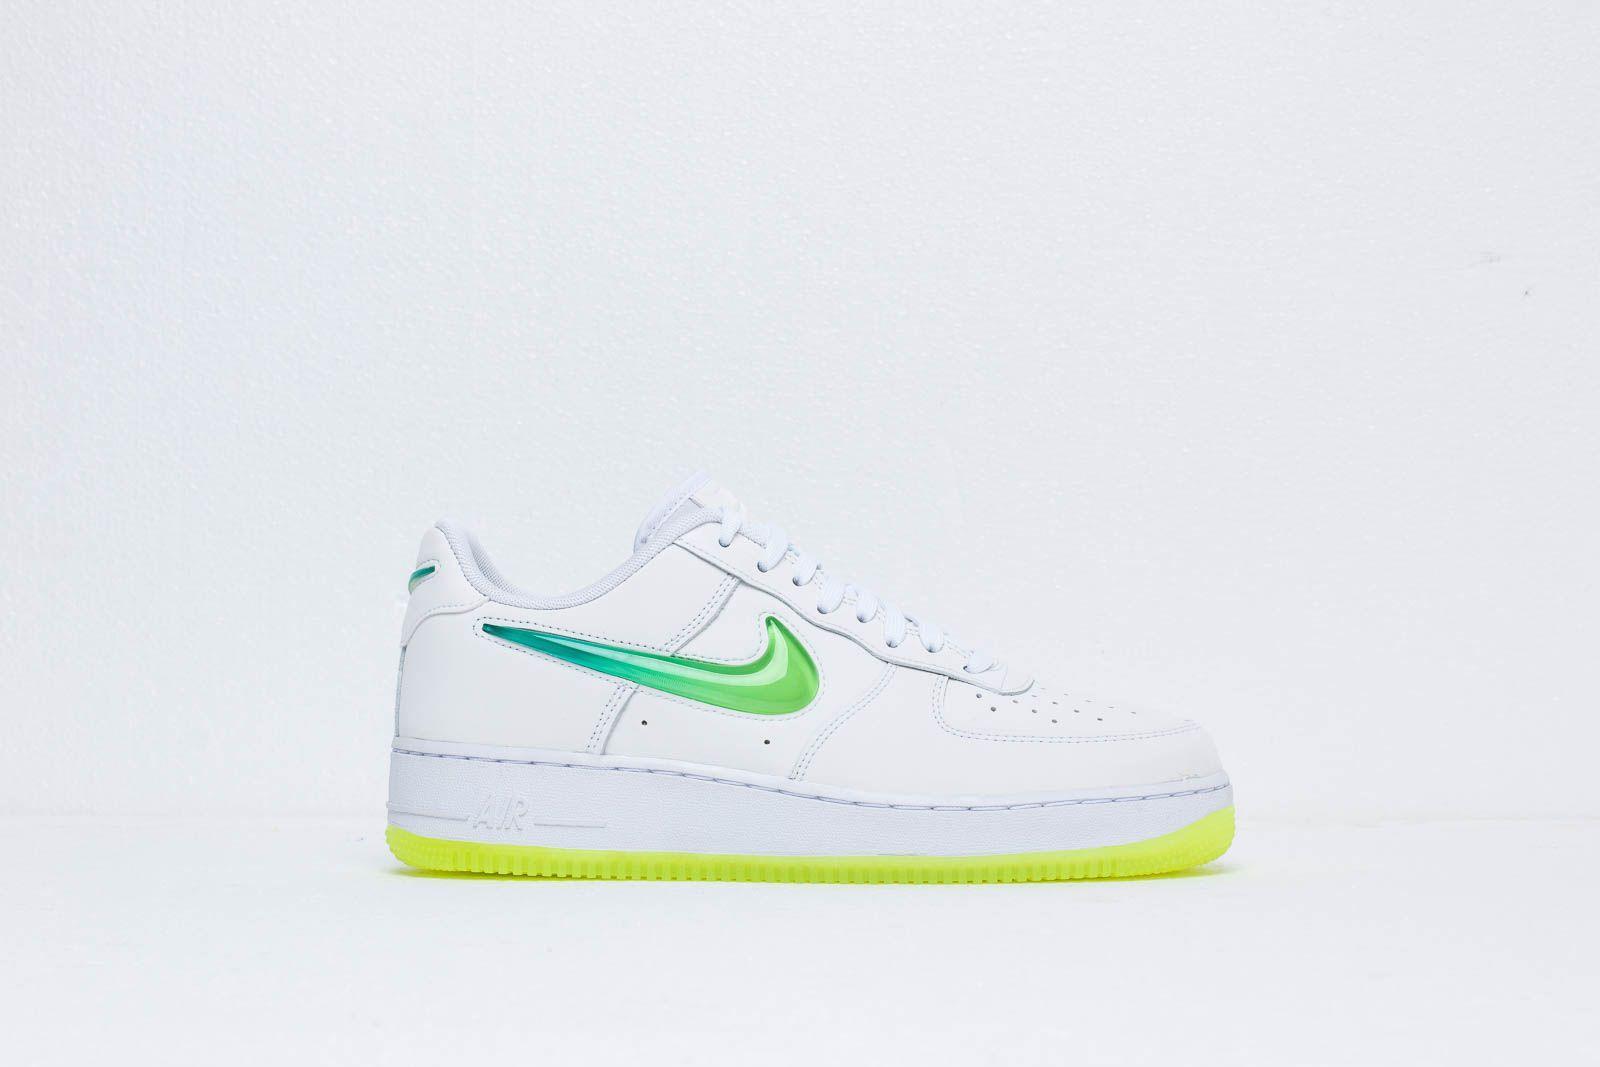 9527c0b3b2f4a Nike Air Force 1 '07 Prm 2 White/ Volt-hyper Jade in White for Men ...